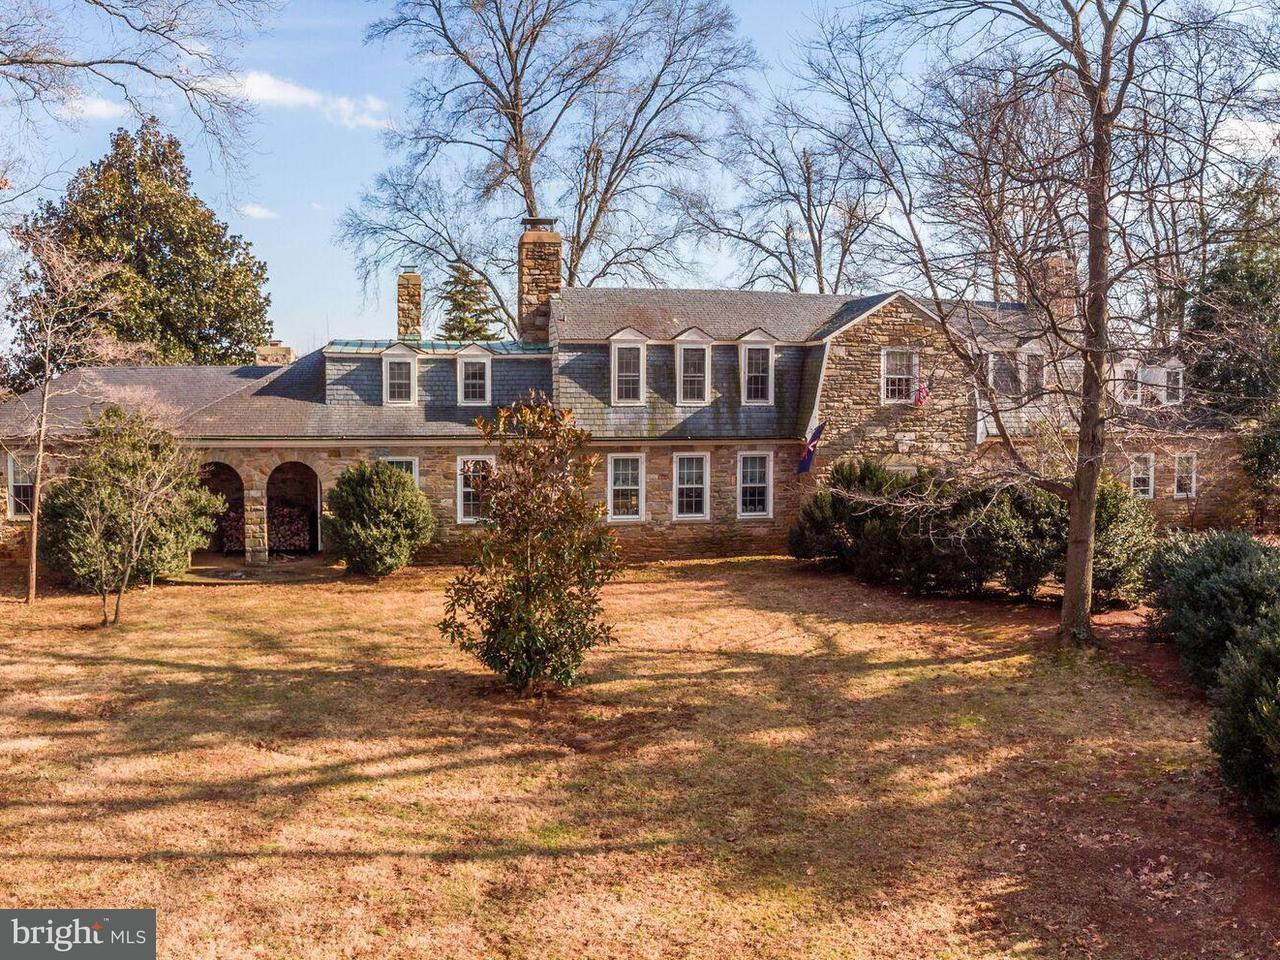 獨棟家庭住宅 為 出售 在 8523 Lees Ridge Road 8523 Lees Ridge Road Warrenton, 弗吉尼亞州 20186 美國